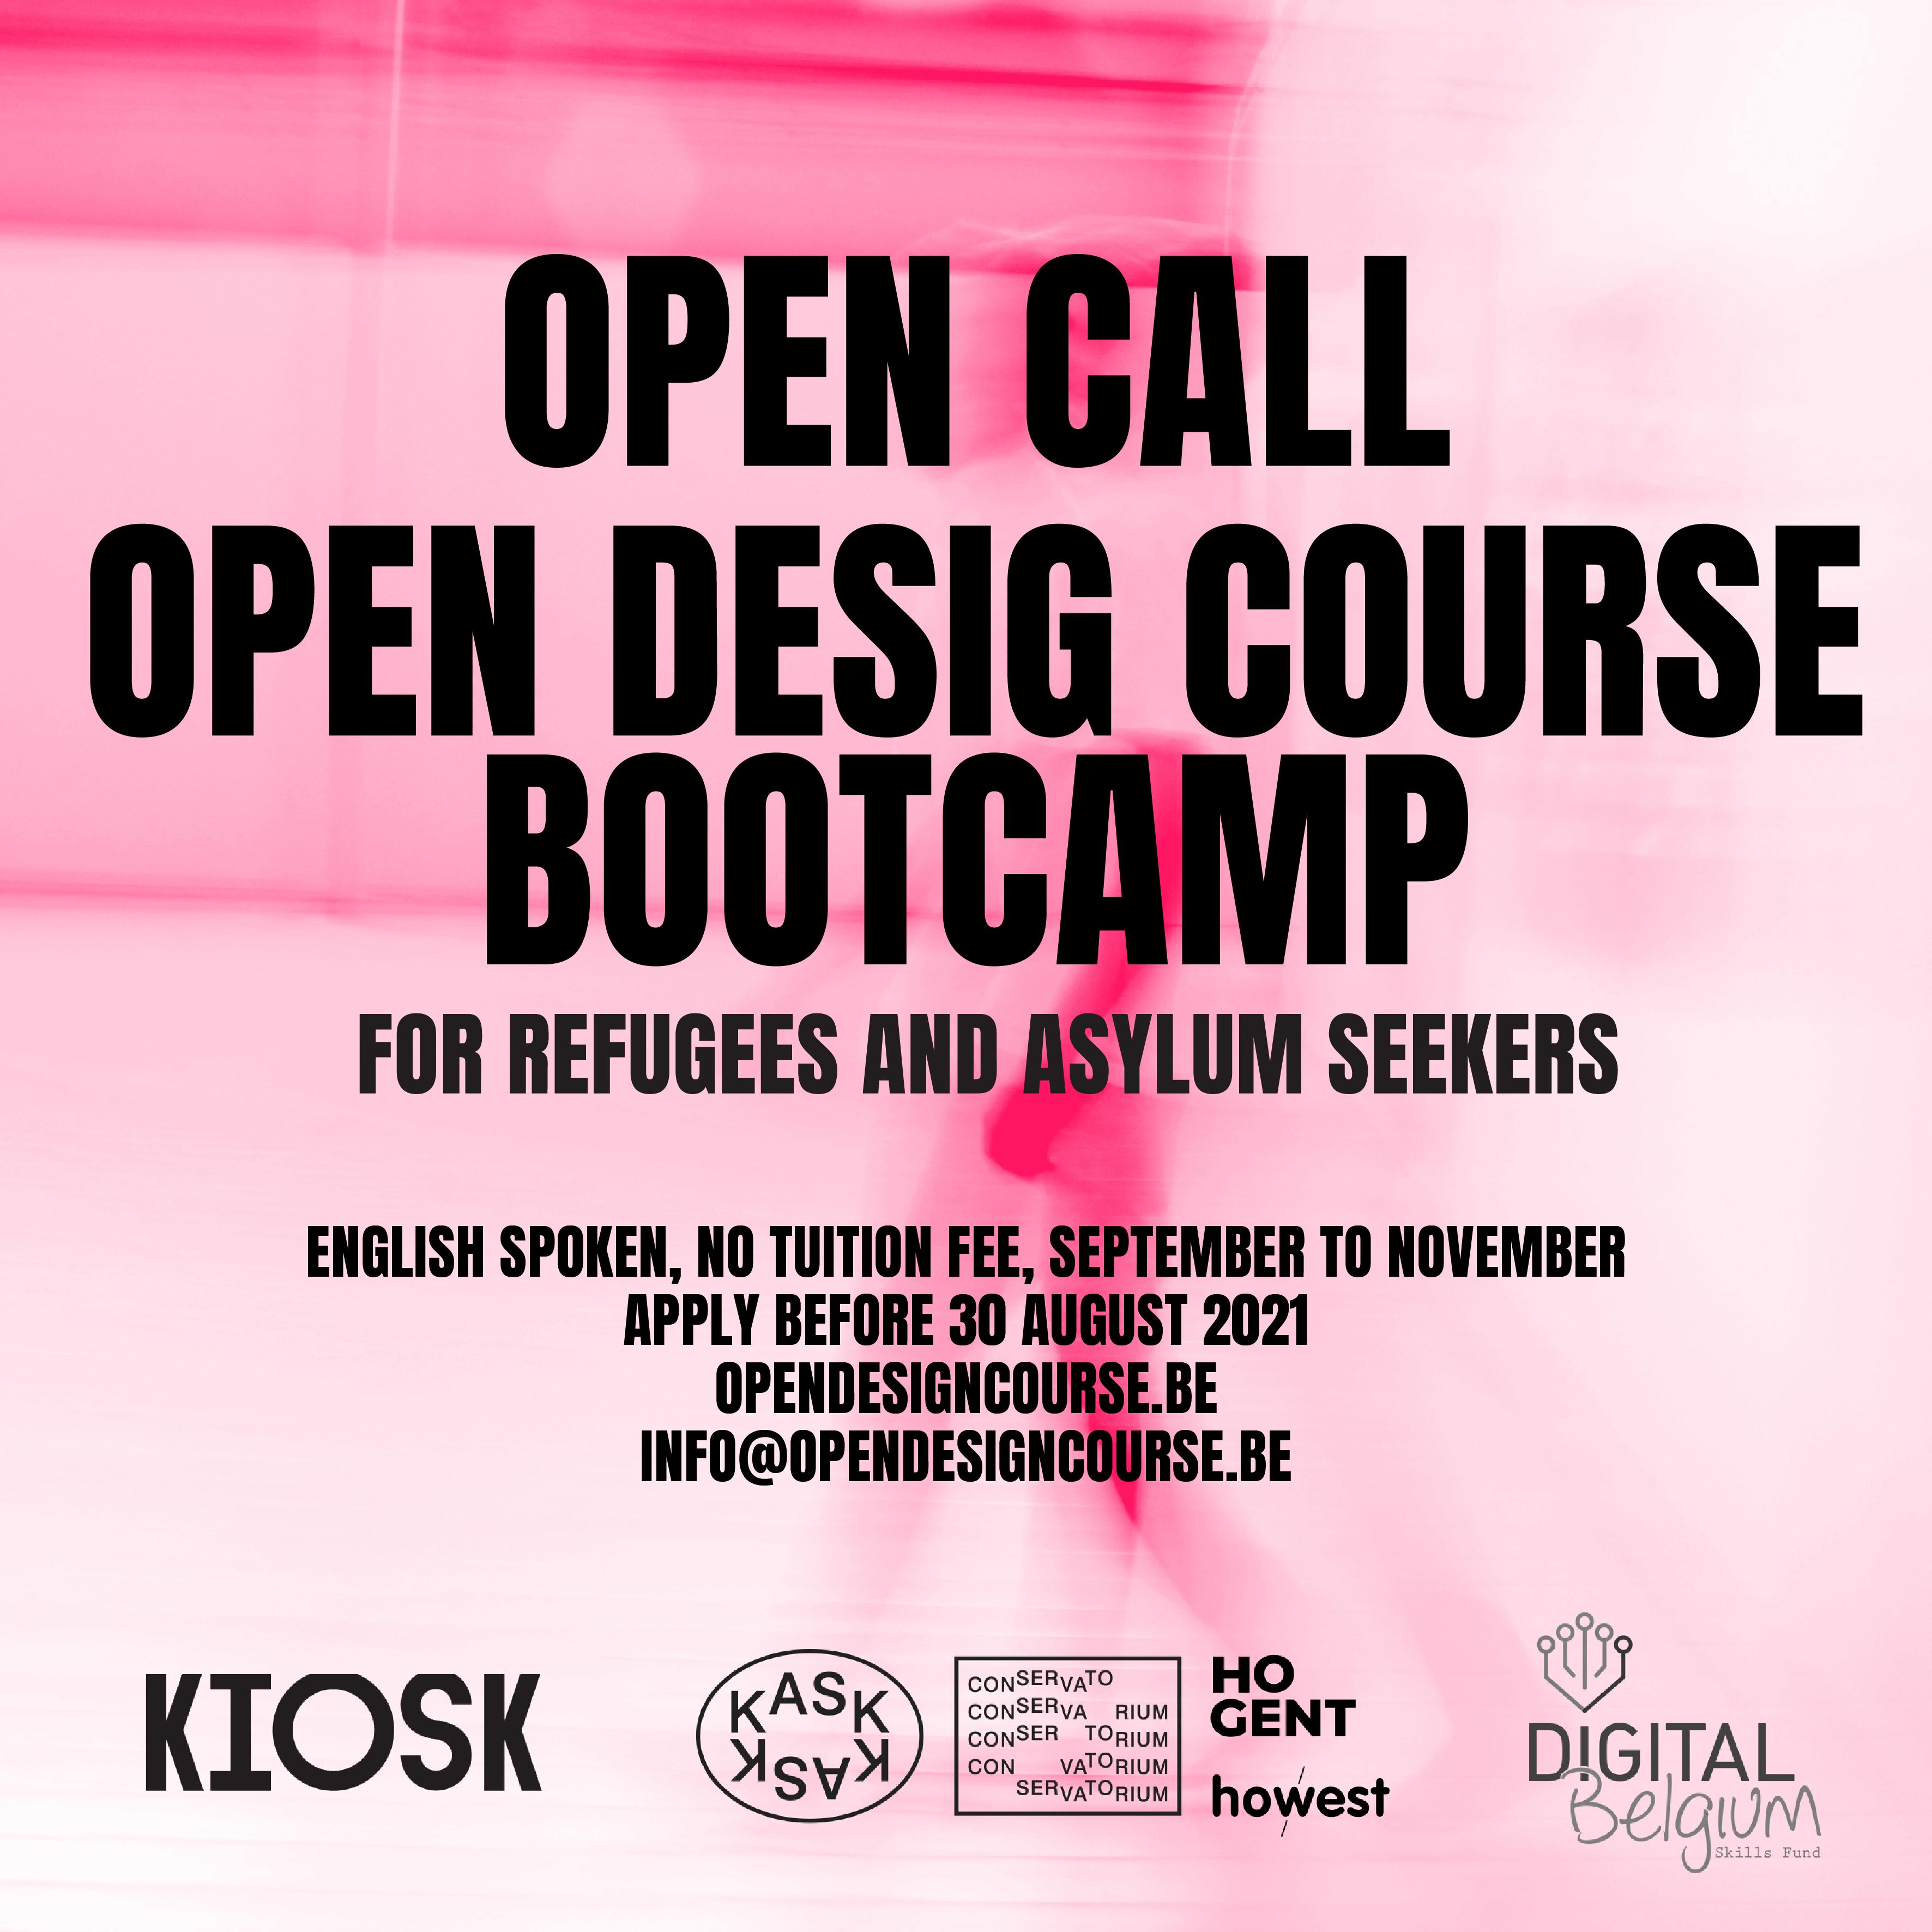 Bootcamp 2021 Open call